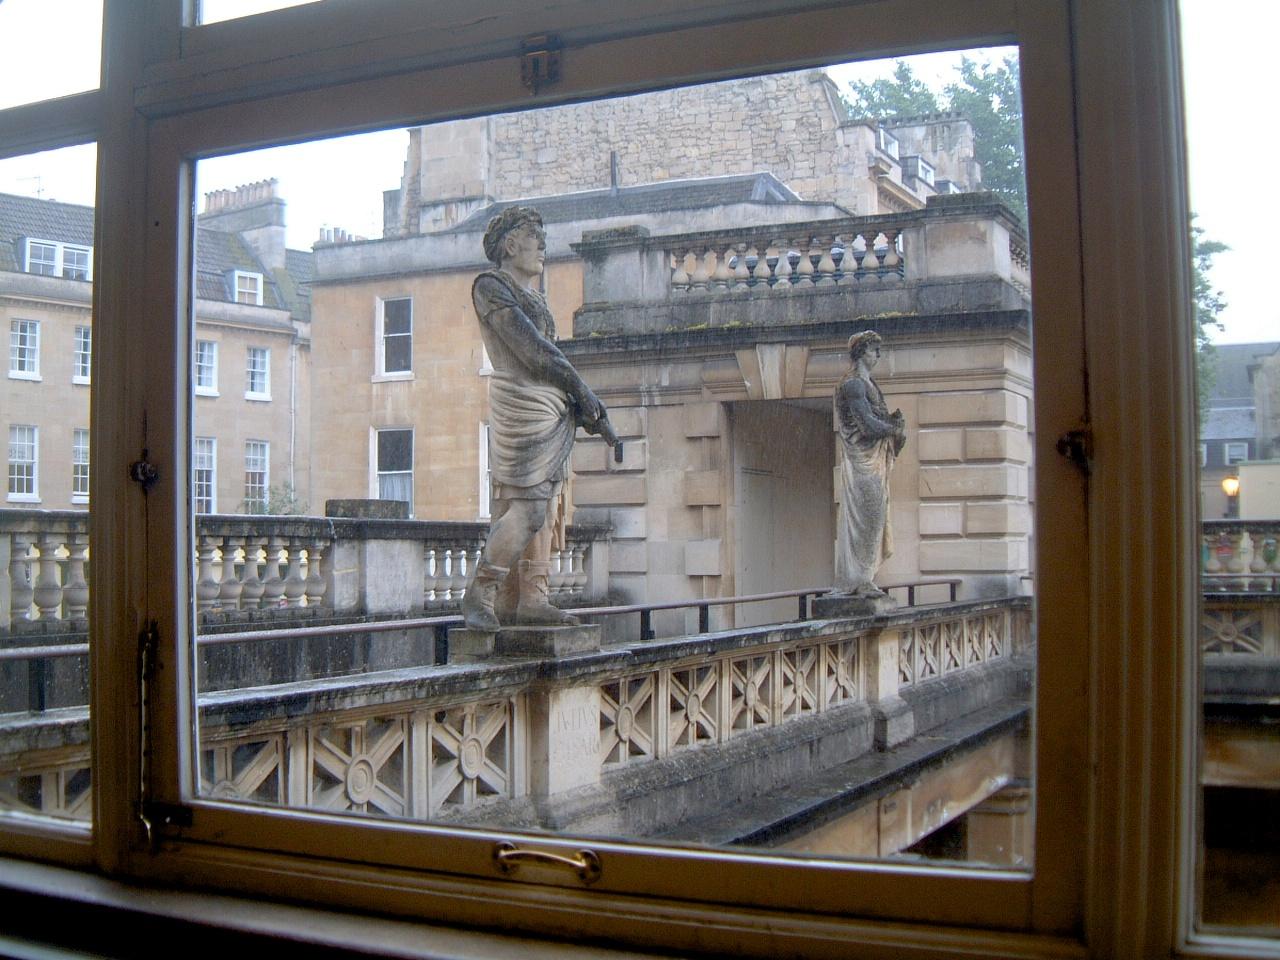 Above the Roman Baths